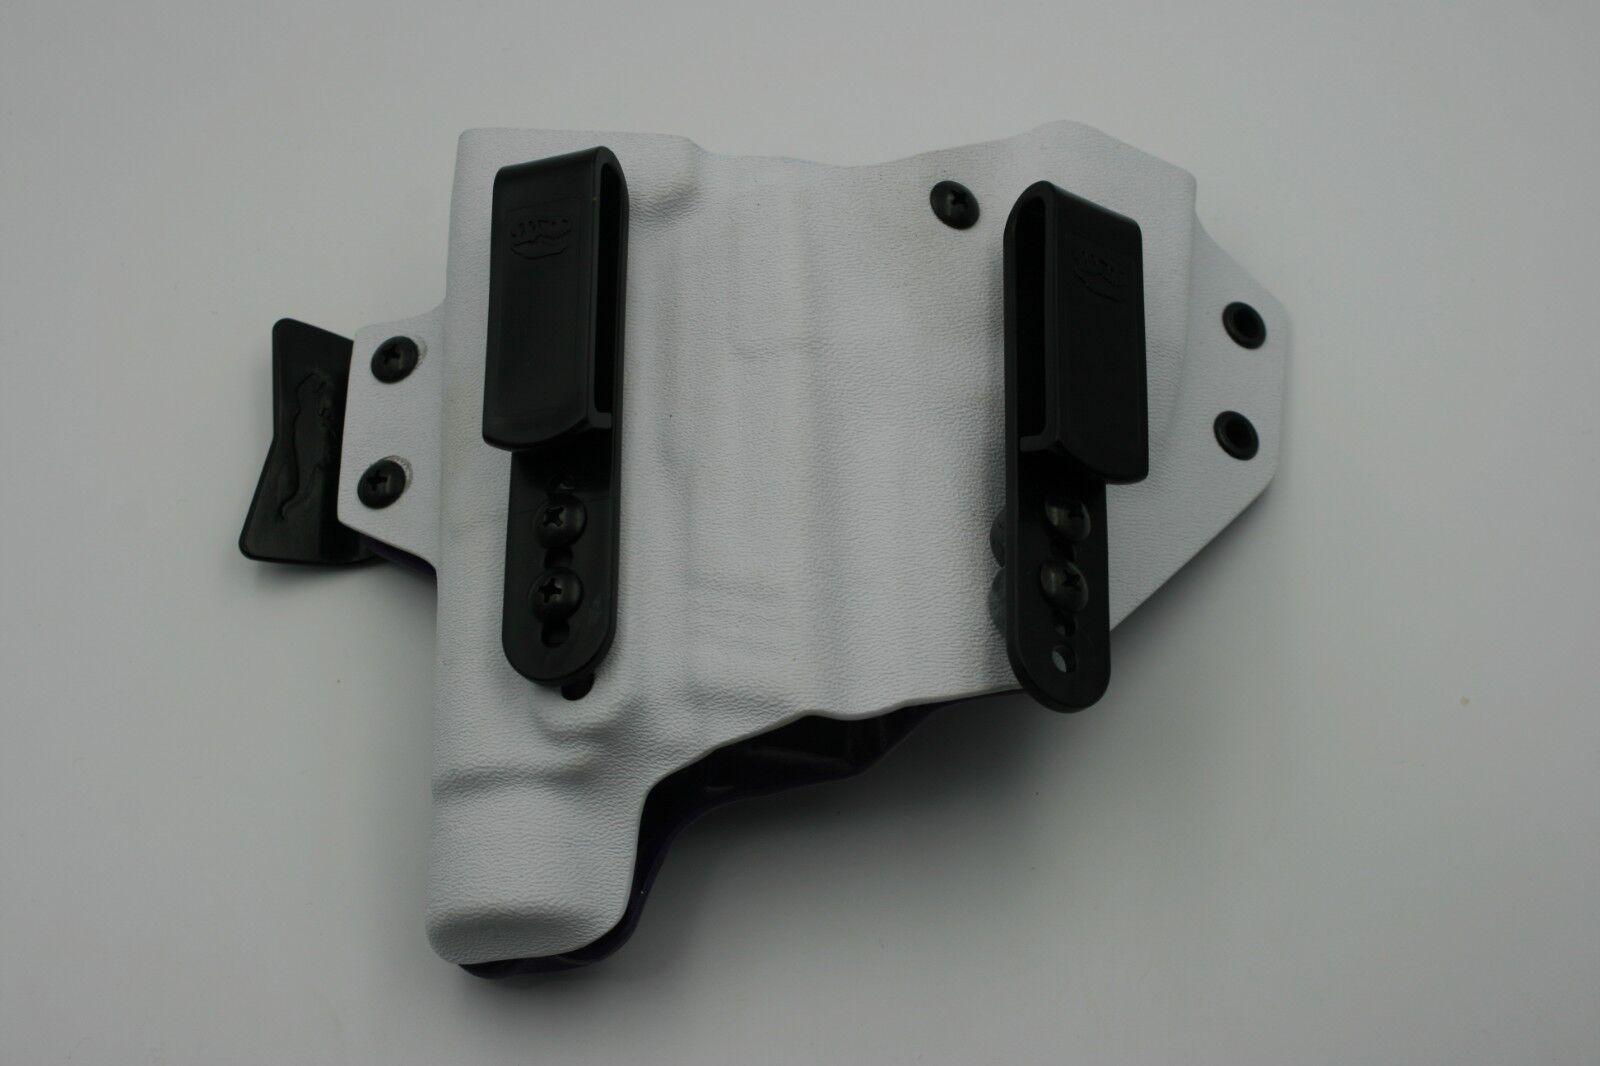 T. Rex Arms S&W M&P 4  M2.0 TLR-1 Sidecar (2nd) Funda apéndice Kydex